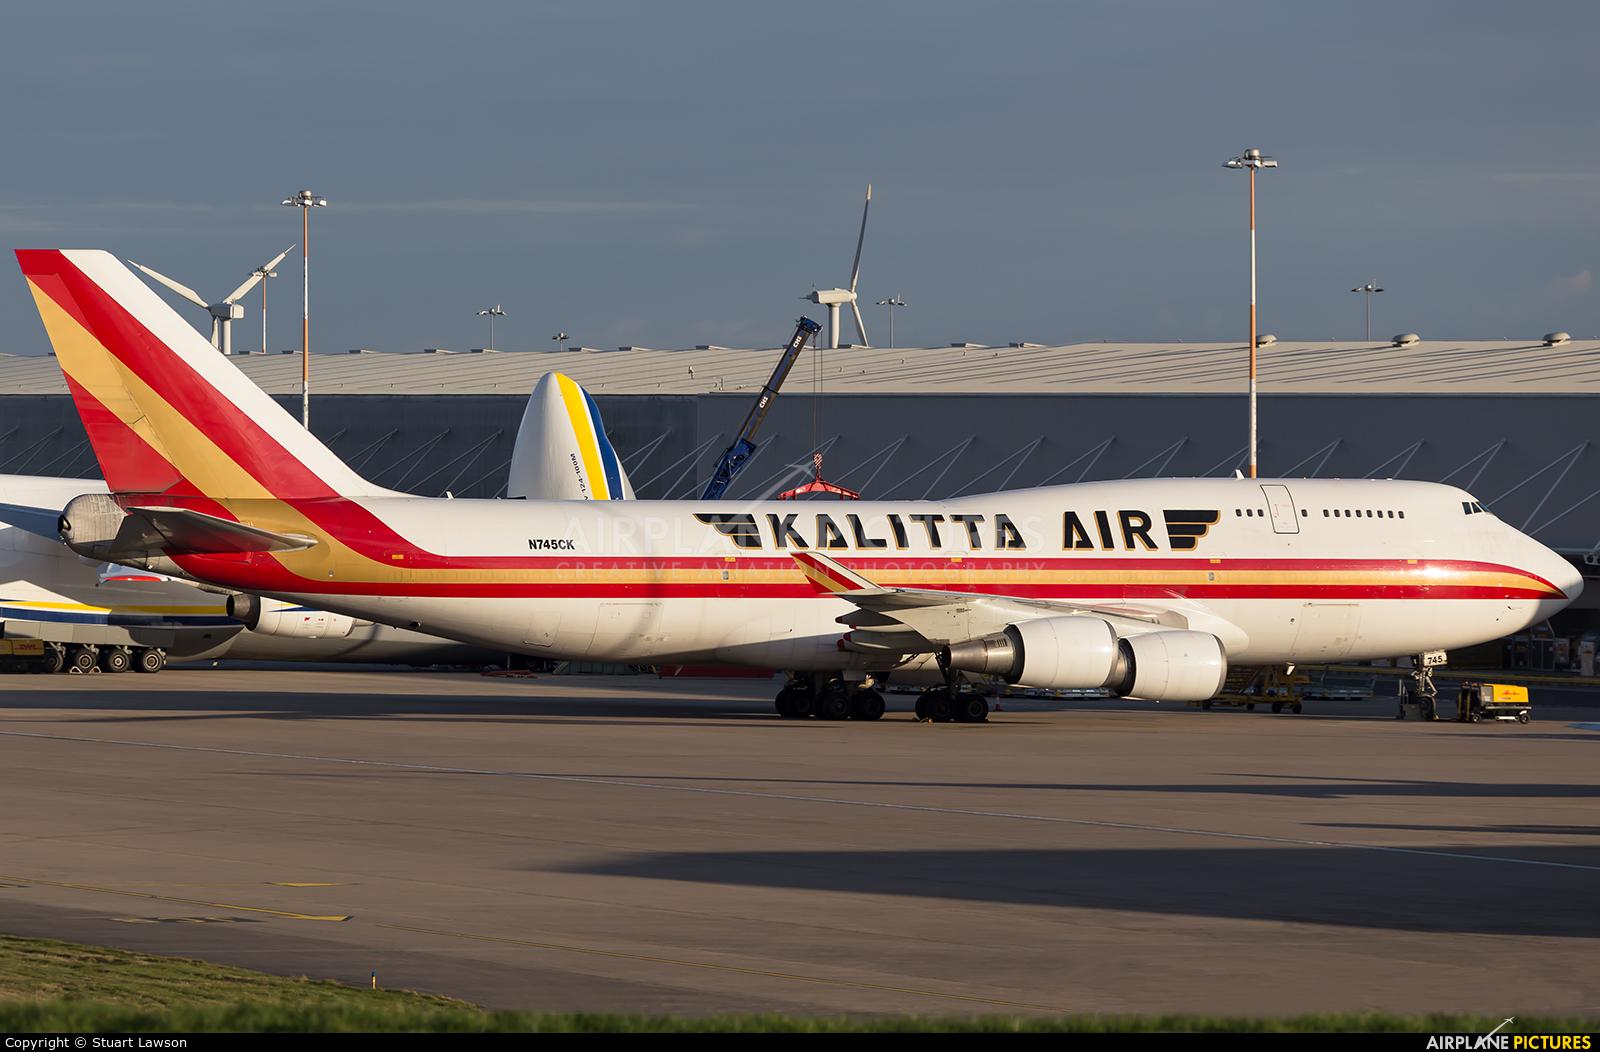 Kalitta Air N745CK aircraft at East Midlands